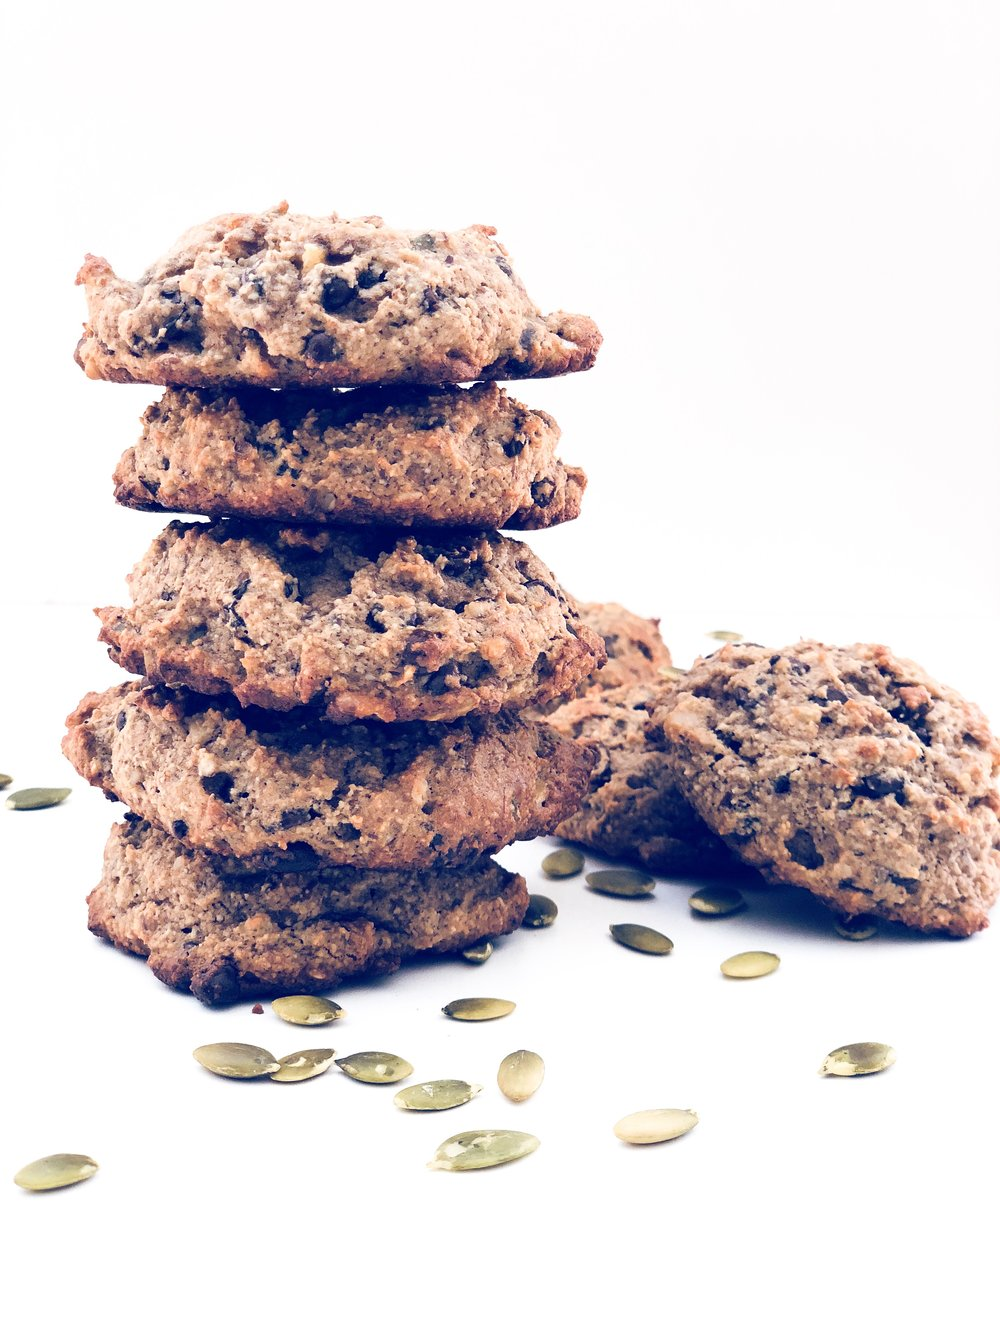 muffin top 3.JPG